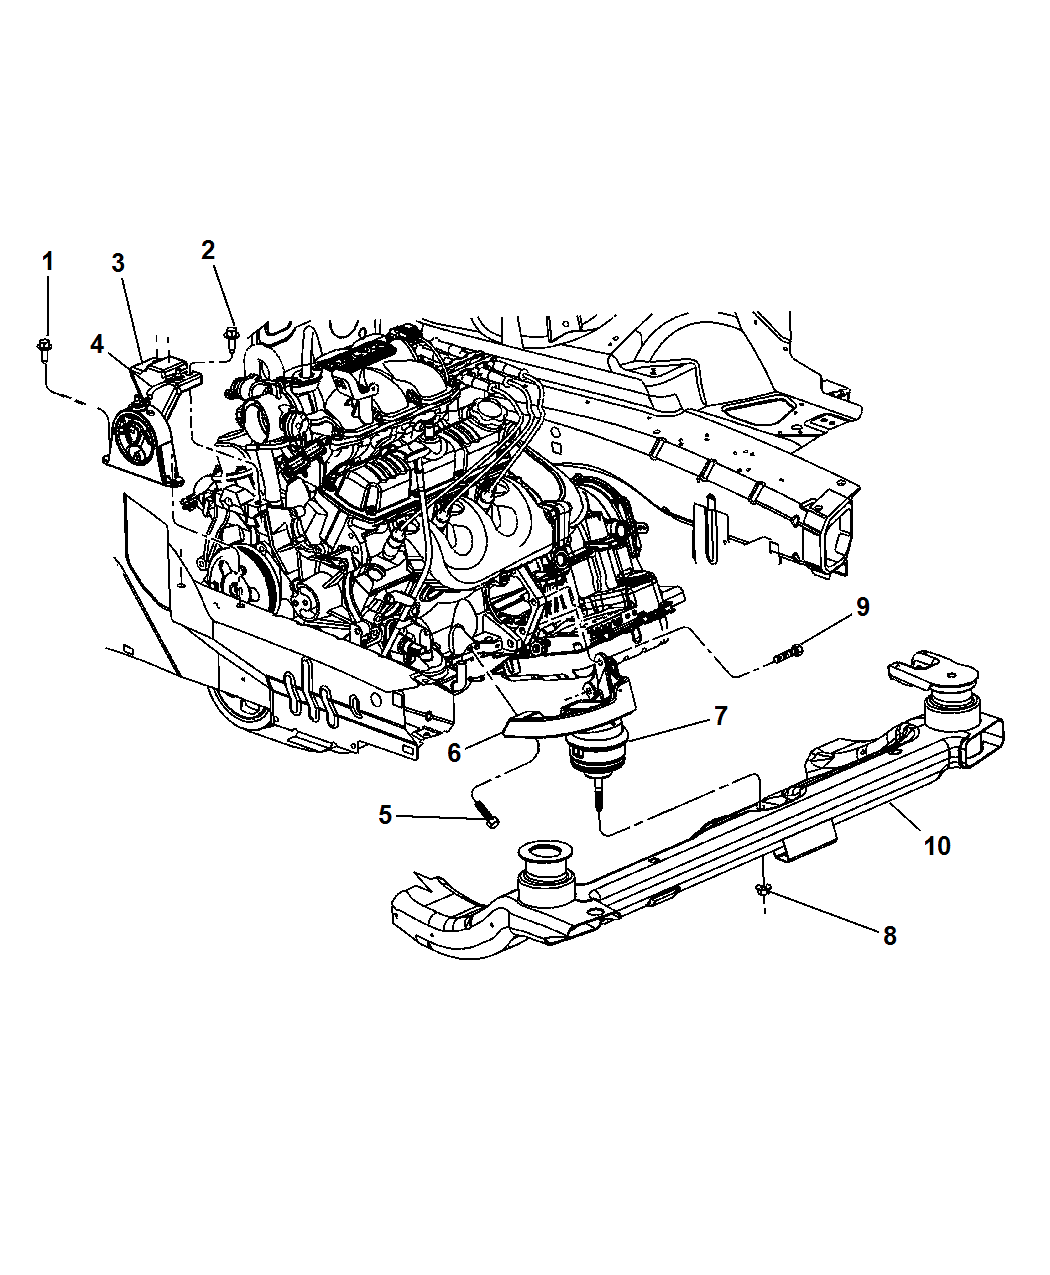 Chrysler 2007 2 7 Engine Diagram - Wiring Diagrams For 2010 Gmc Sierra -  loader.sehidup.jeanjaures37.frWiring Diagram Resource